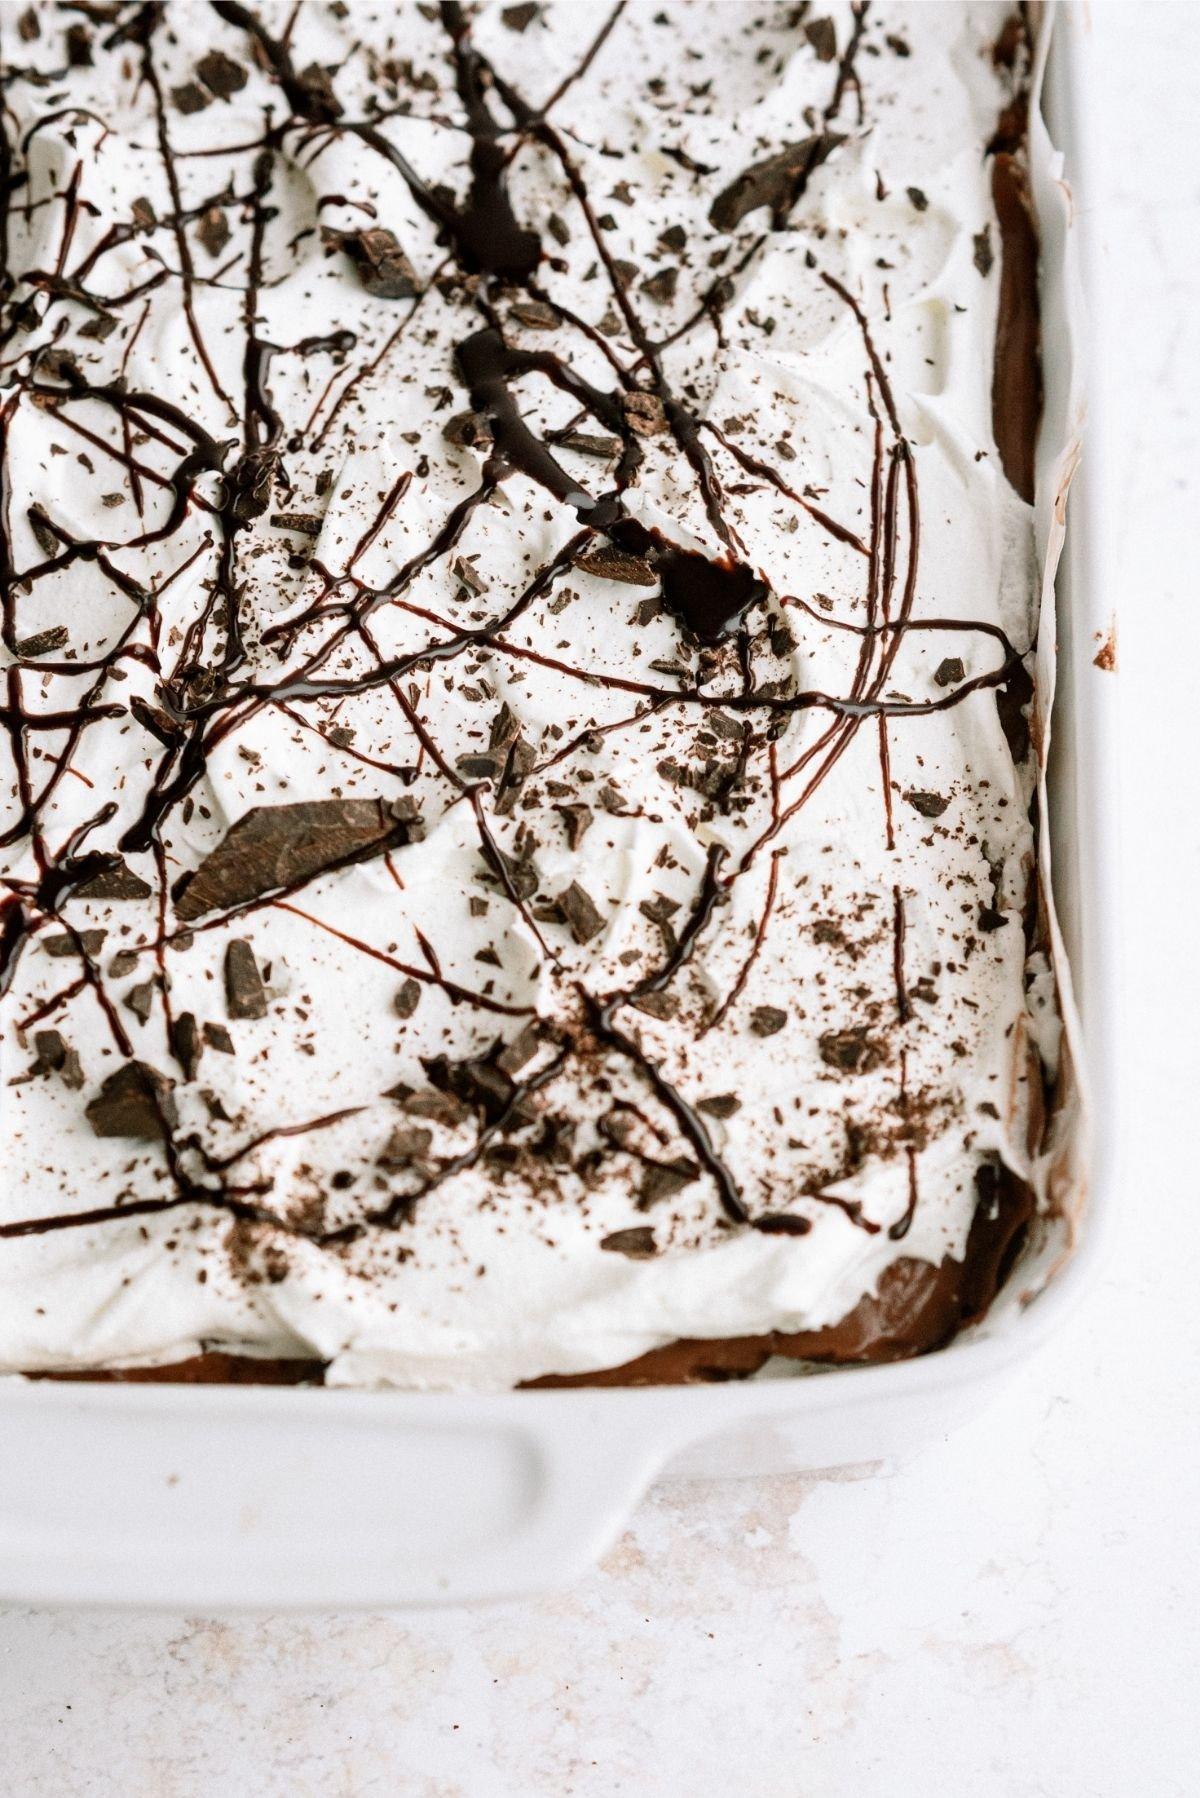 Layered Brownie Pudding Dessert